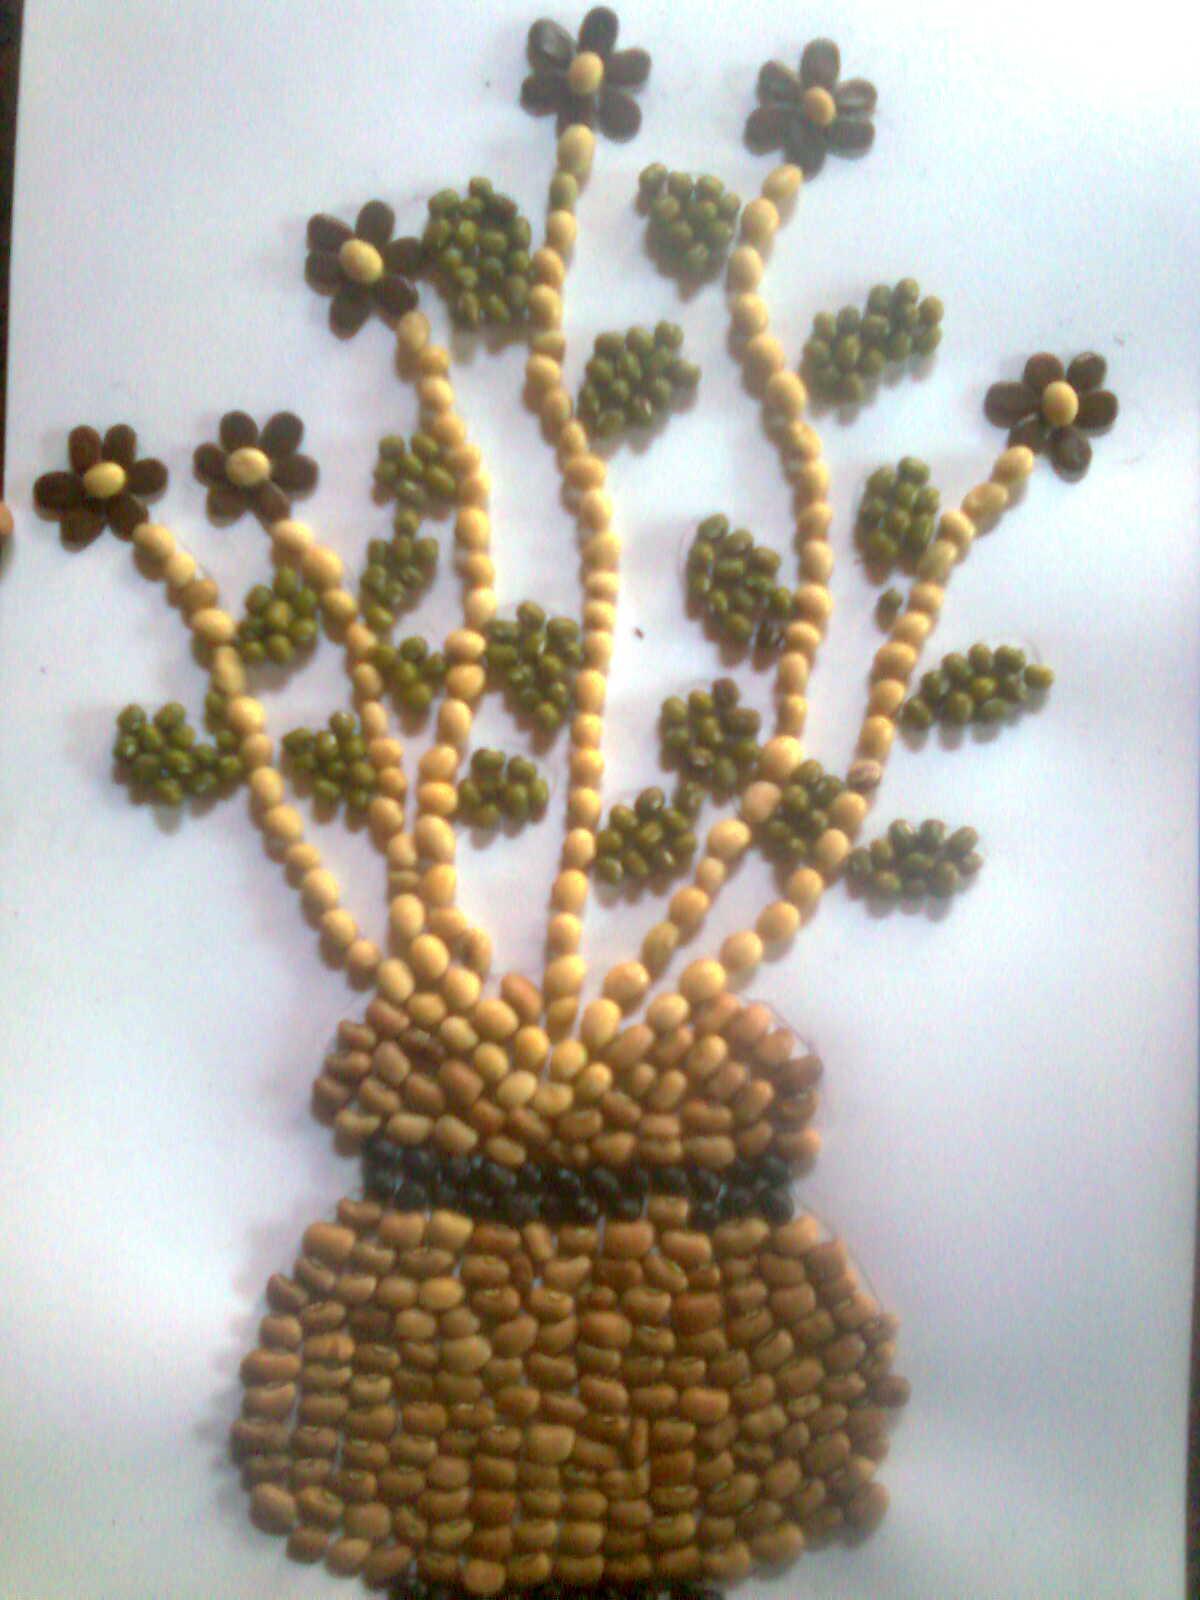 Sebutkan Sifat Sifat Karya Seni Mozaik Berdasarkan Bahannya Brainly Co Id